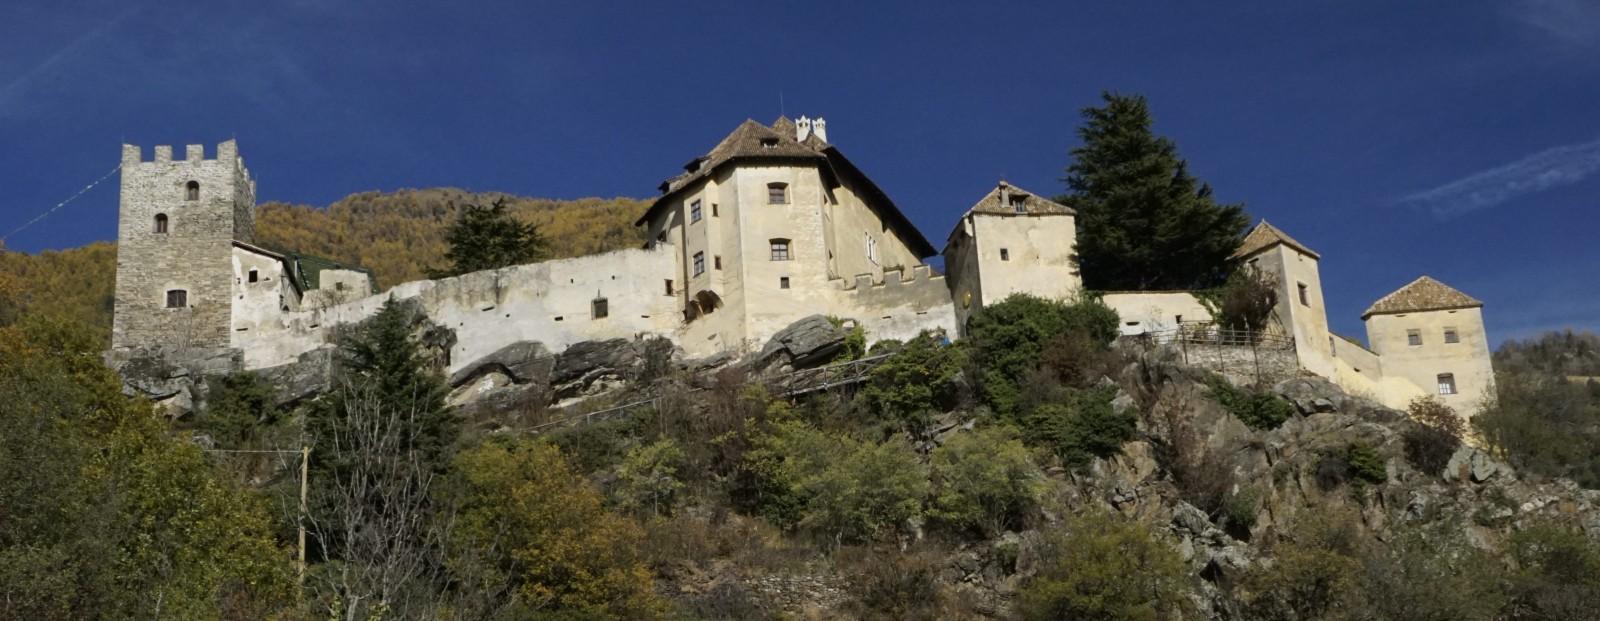 Juval - hrad, letní sídlo a muzeum Reinholda Messnera